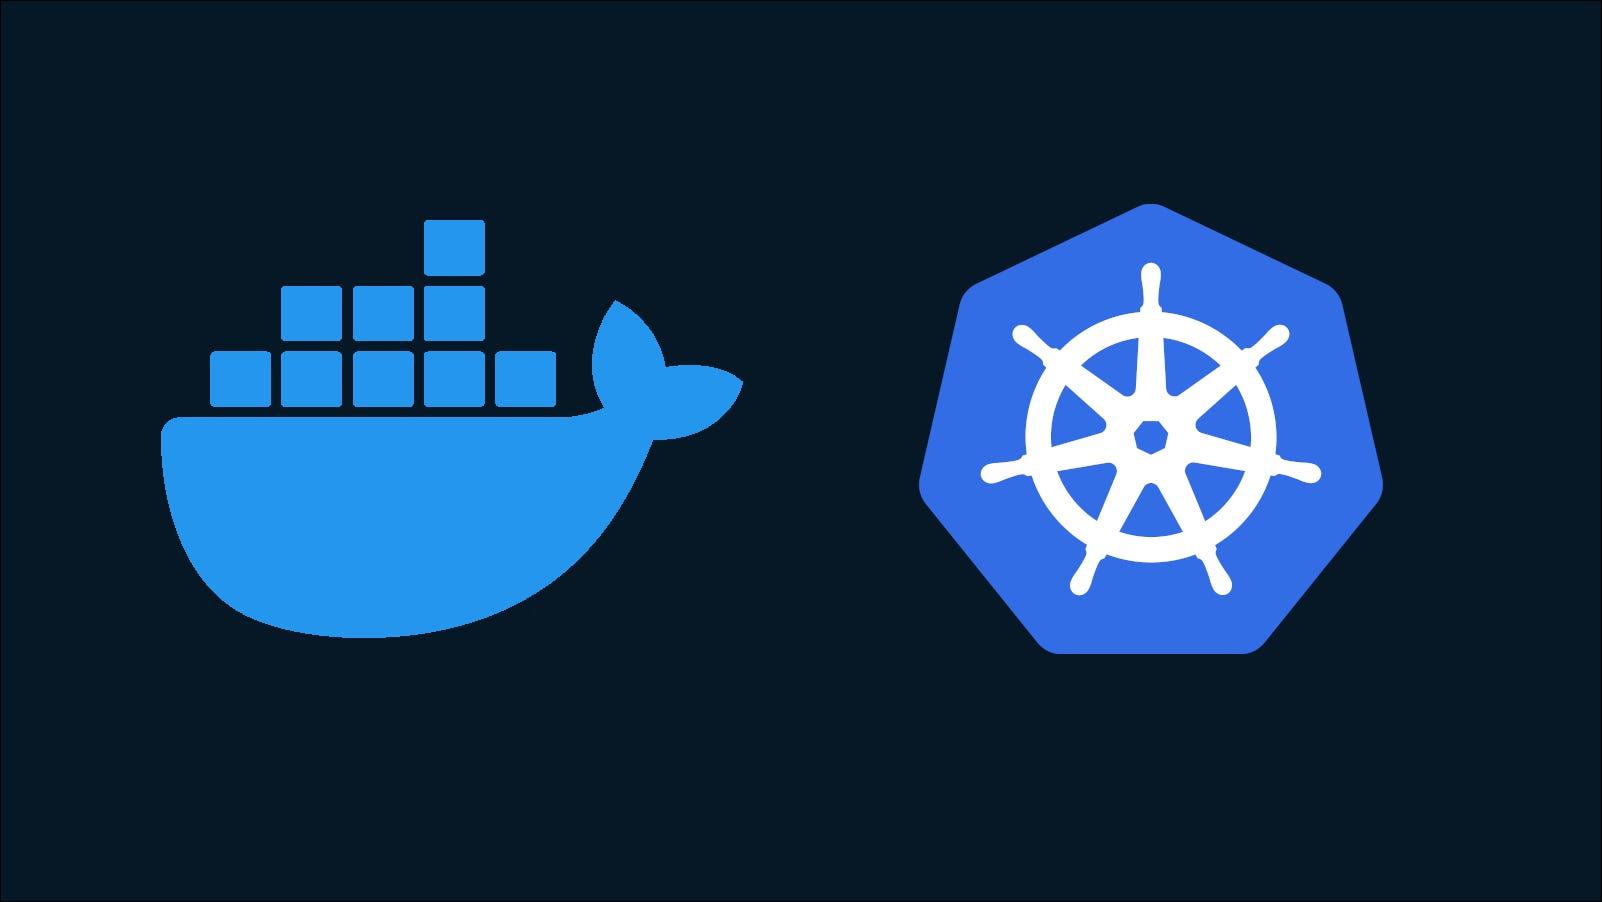 Illustration showing the Docker and Kubernetes logos